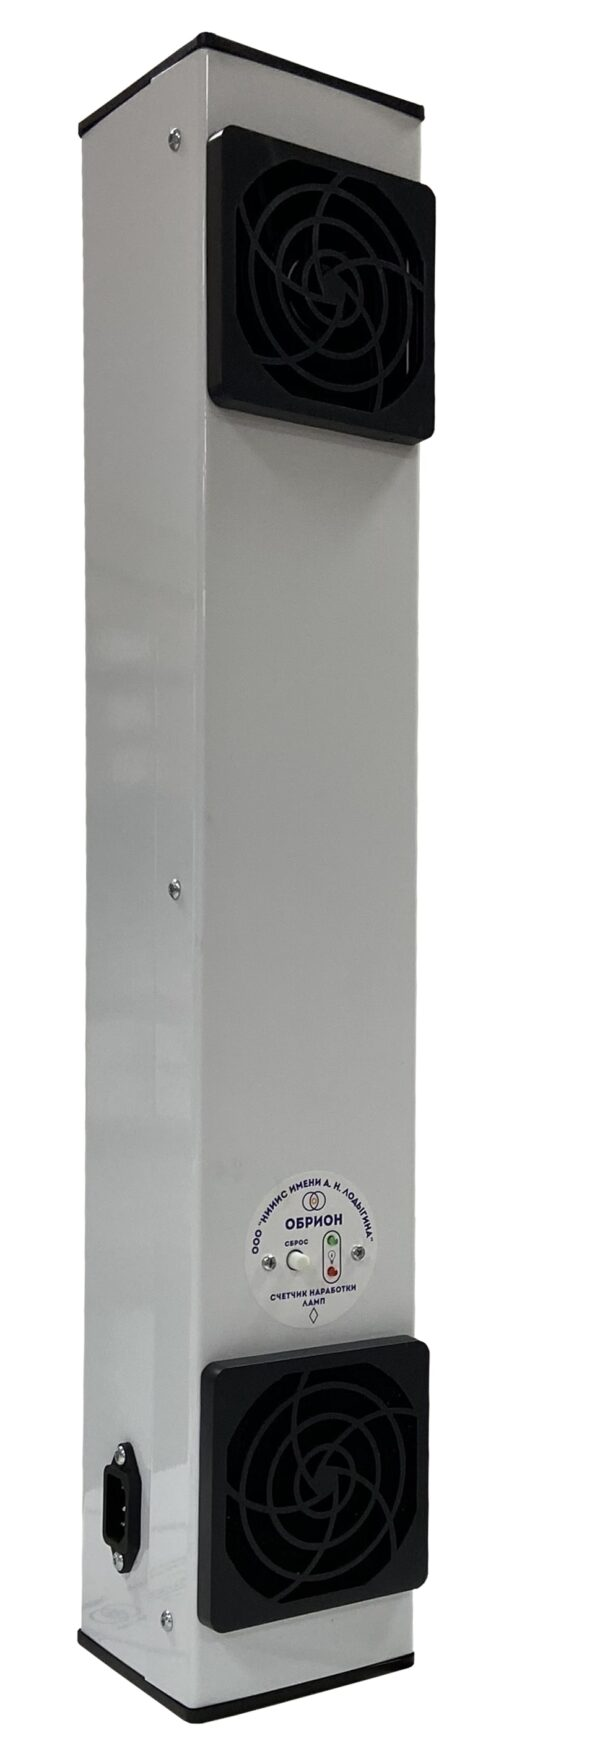 РБО01-2х15-000 ОБРИОН-2